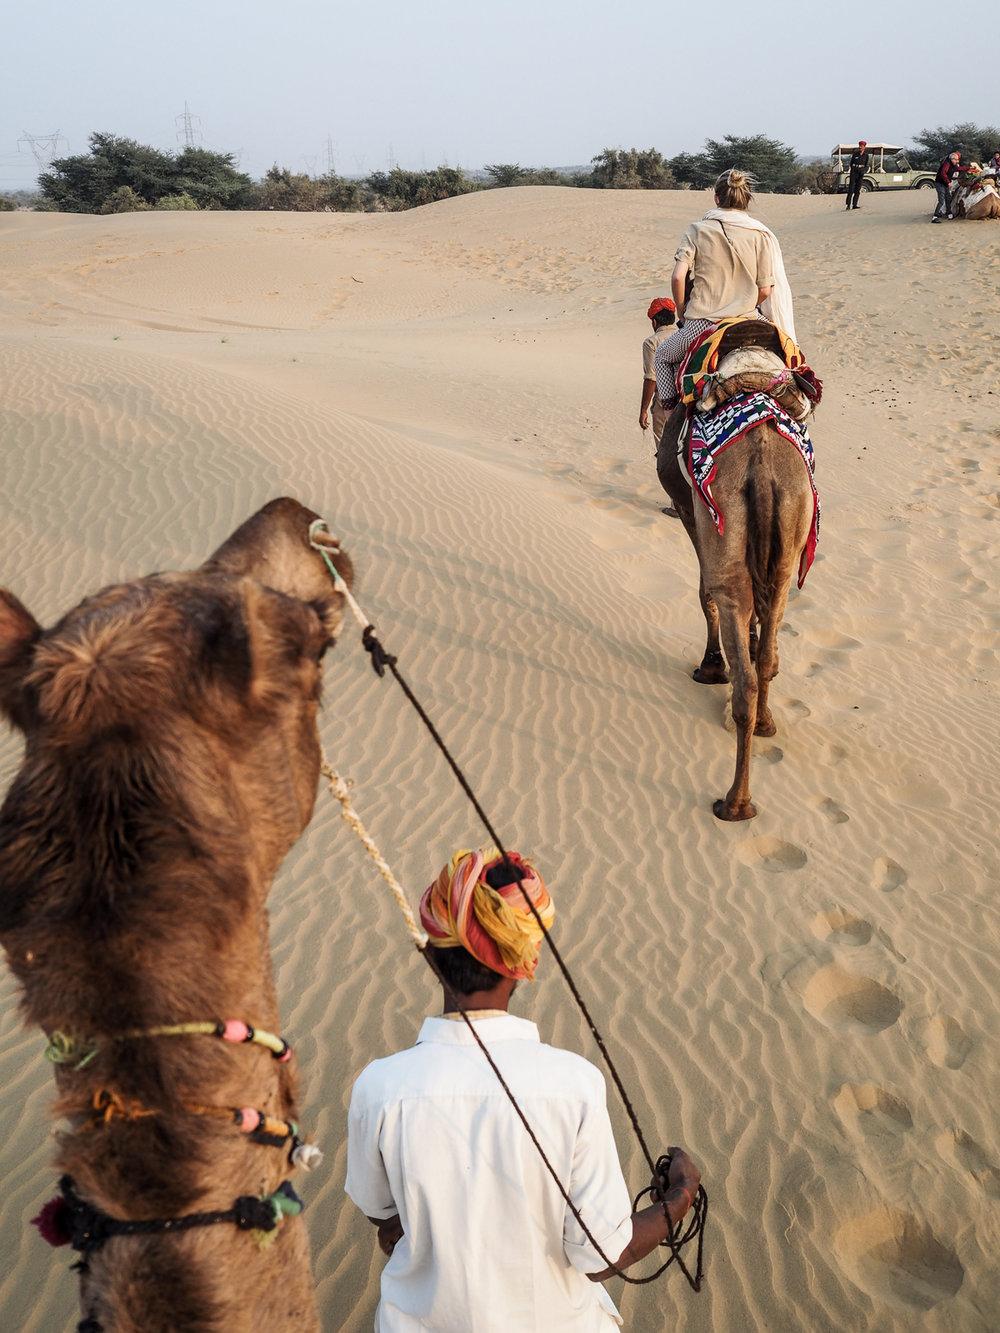 Fashion-Me-Now-Rajasthan-Road-Trip-Jaisalmer-the-Desert_-120.jpg